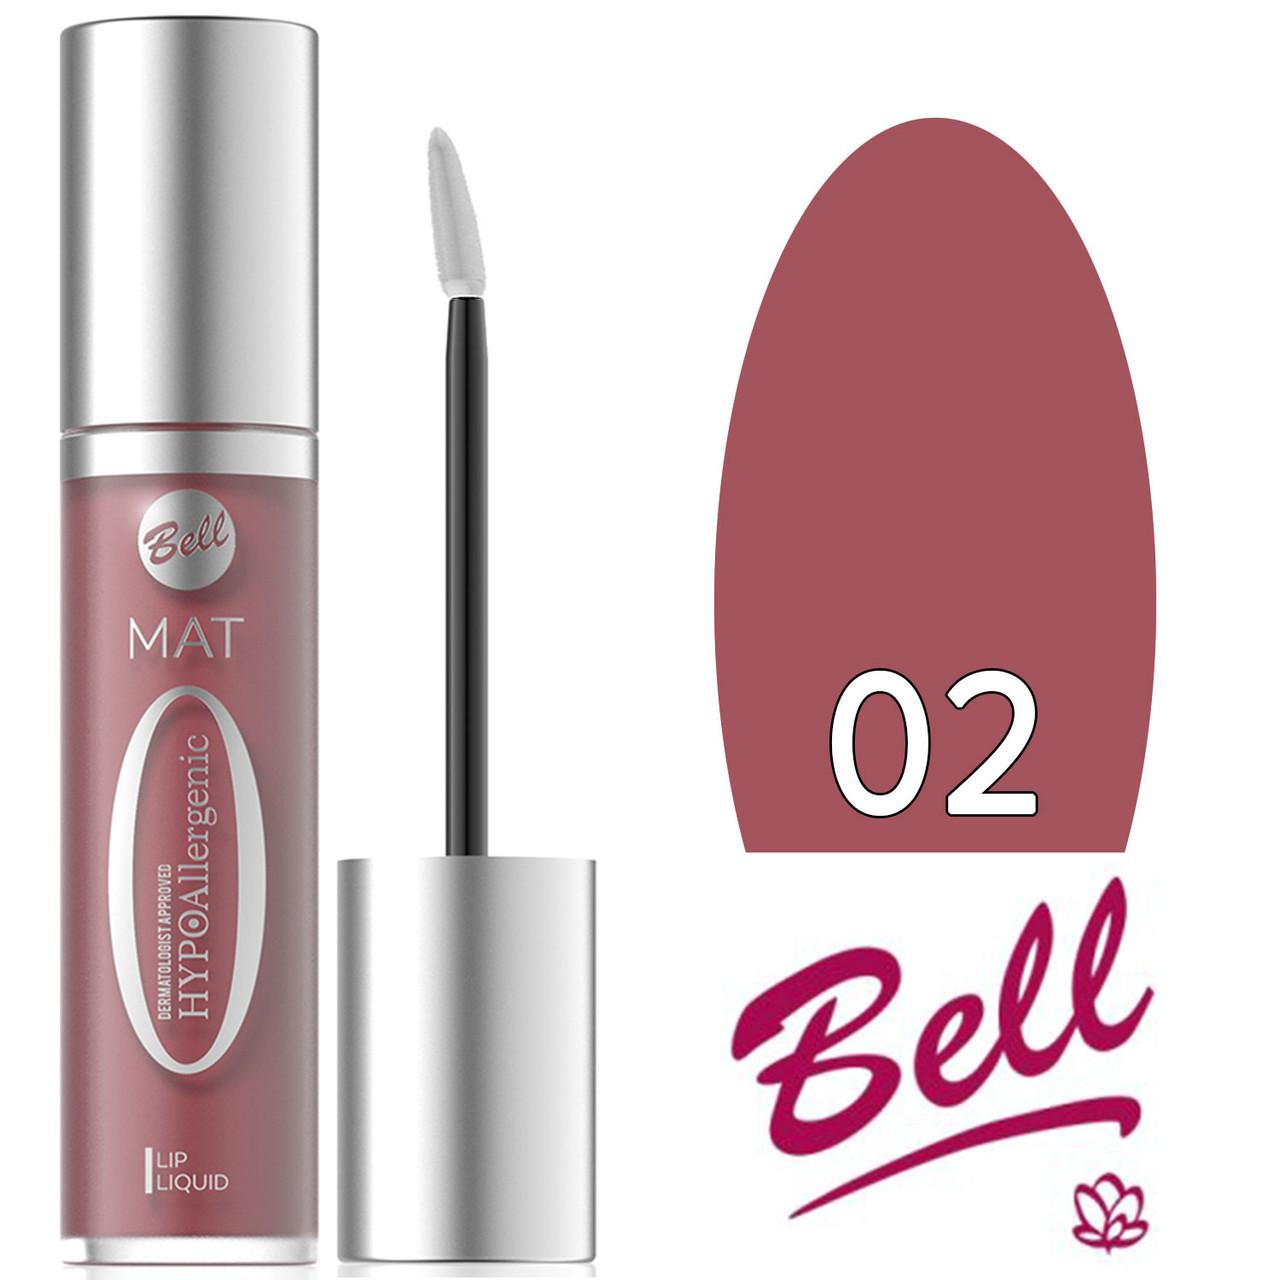 Bell HypoAllergenic - Жидкая губная помада Mat Lip Liquid Тон 02 pink lilac матовая